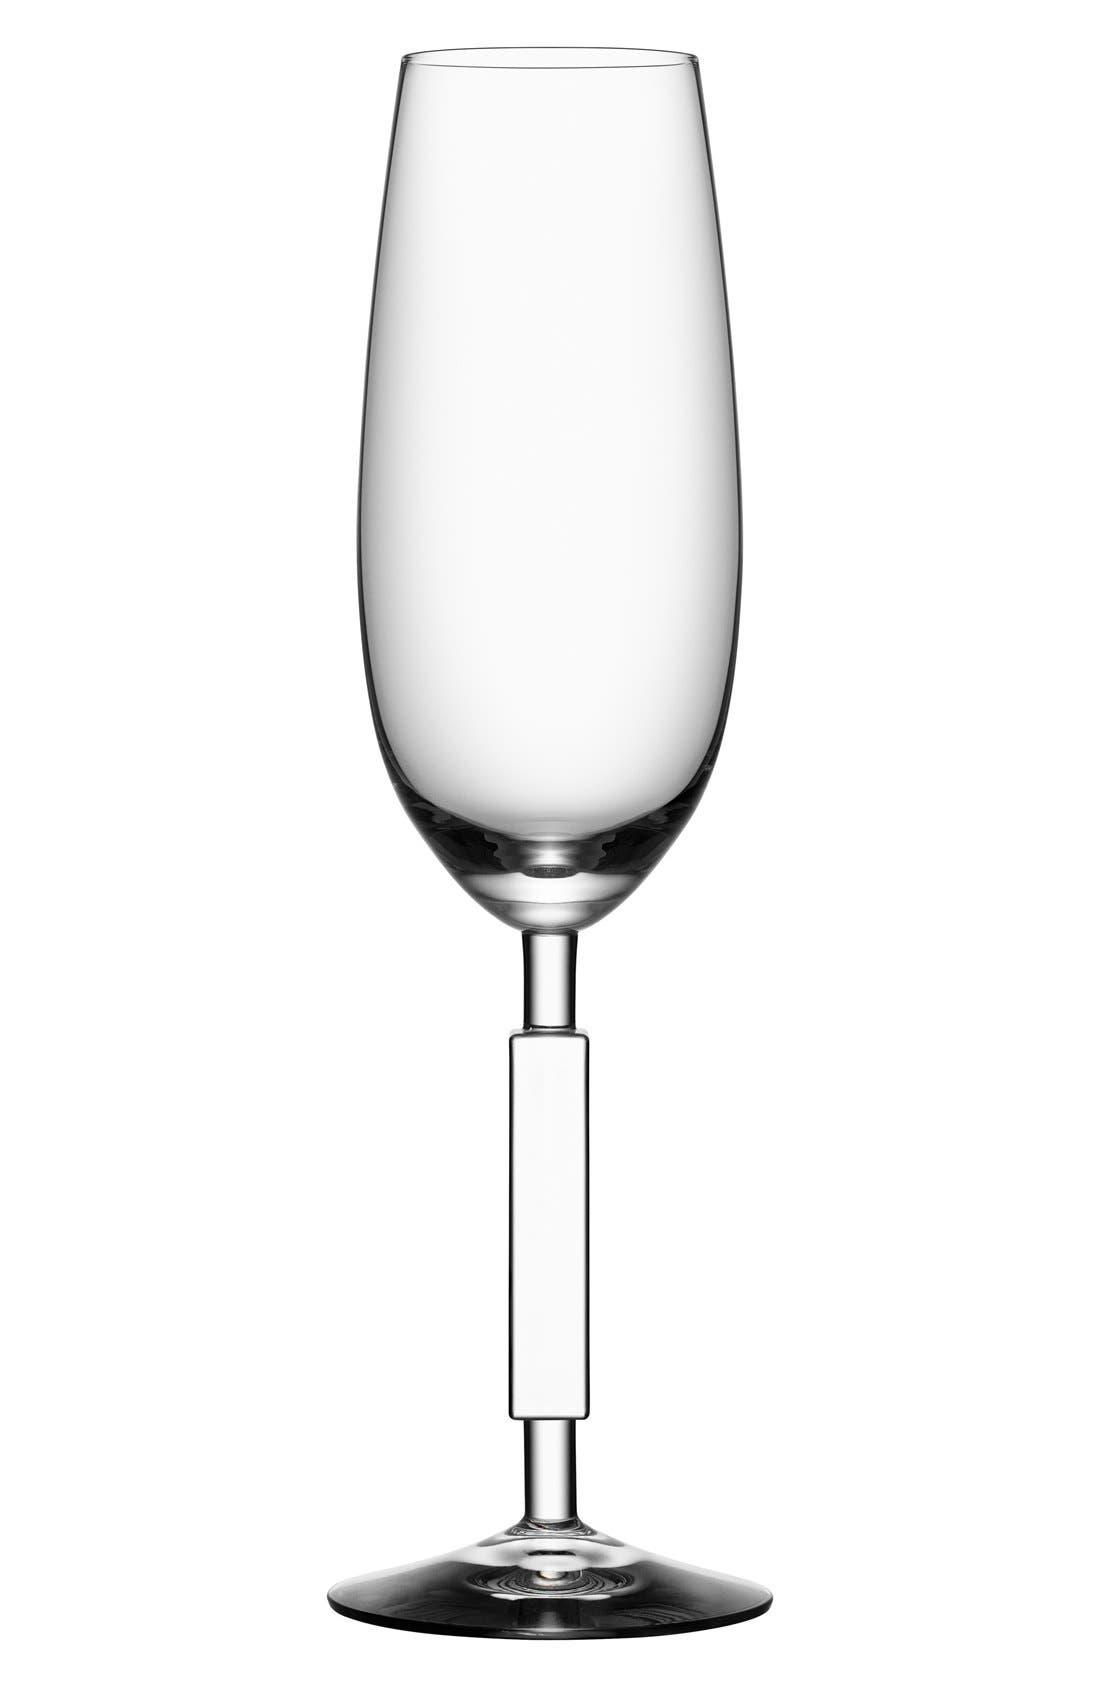 ORREFORS 'Unique' ChampagneFlute